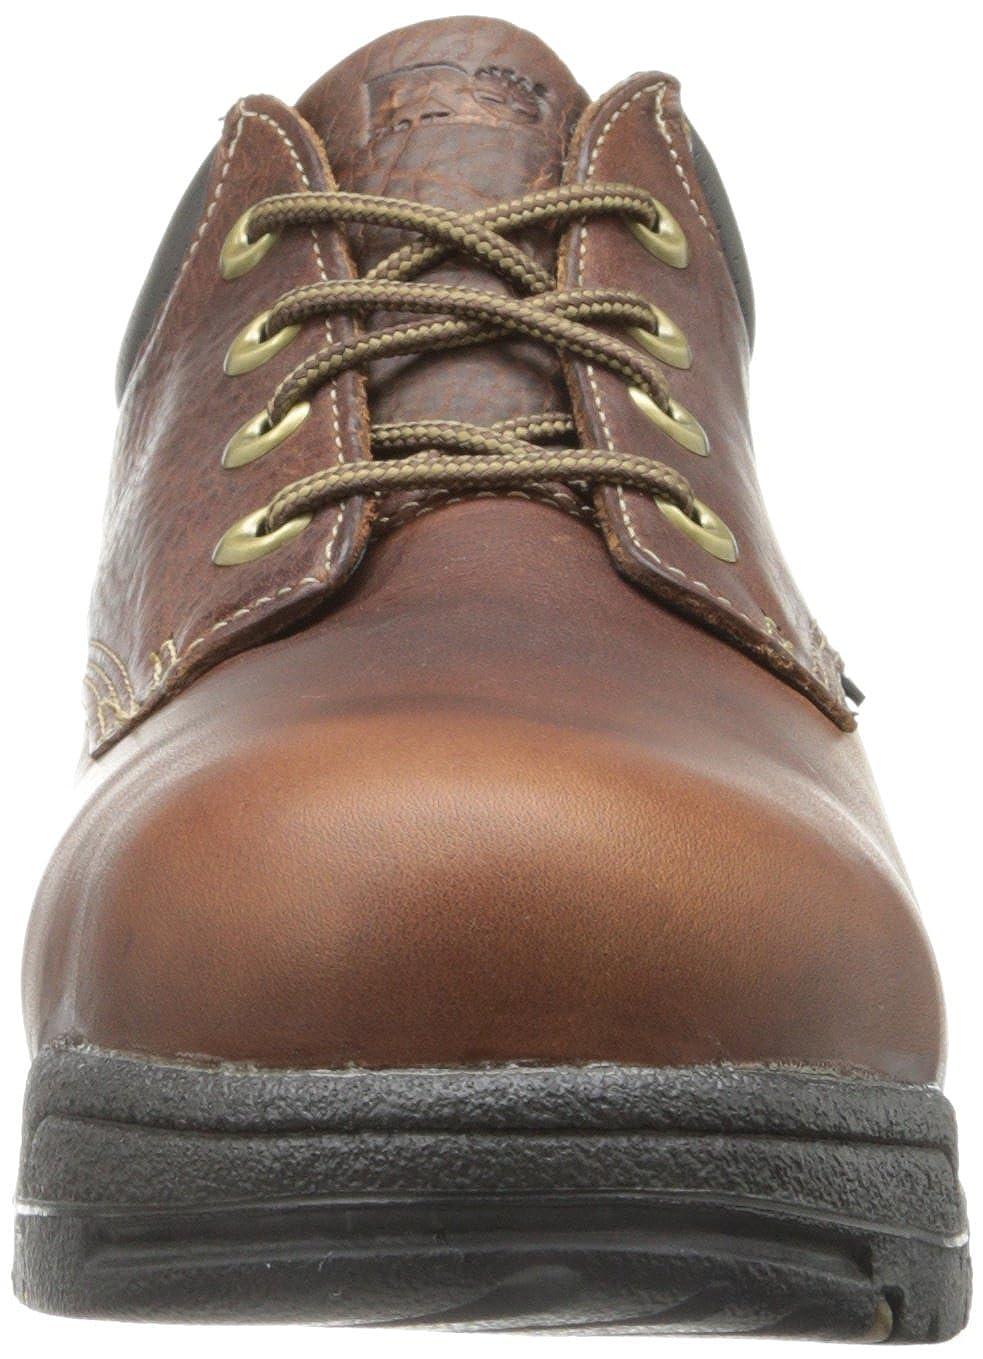 b4ed70071bd672 Amazon.com: Timberland PRO Men's Titan Safety Toe Oxford: Shoes